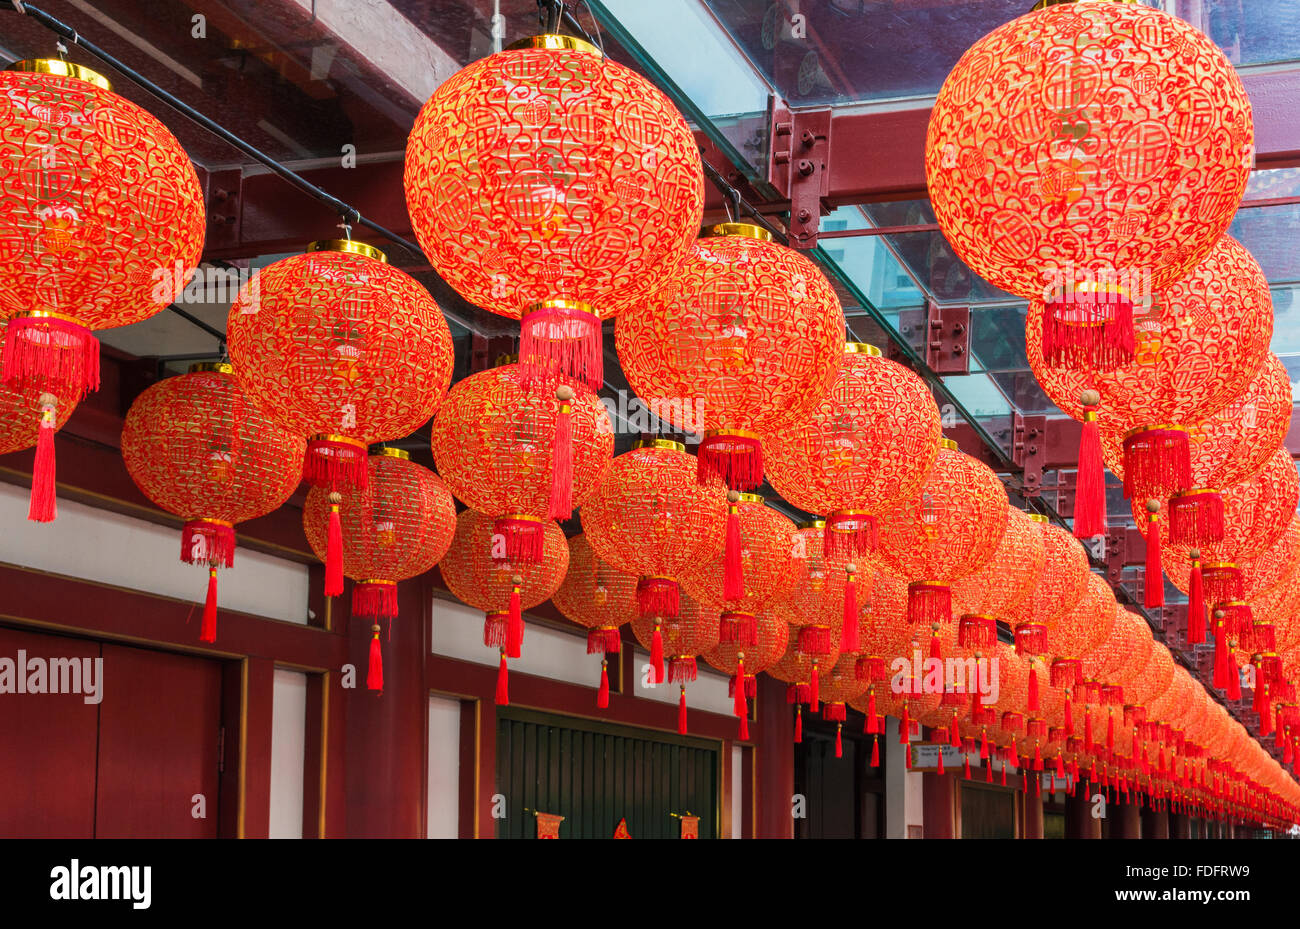 Lanternes rouges traditionnels pendre du Buddha Tooth Relic Temple and Museum pendant le Nouvel An chinois à Photo Stock